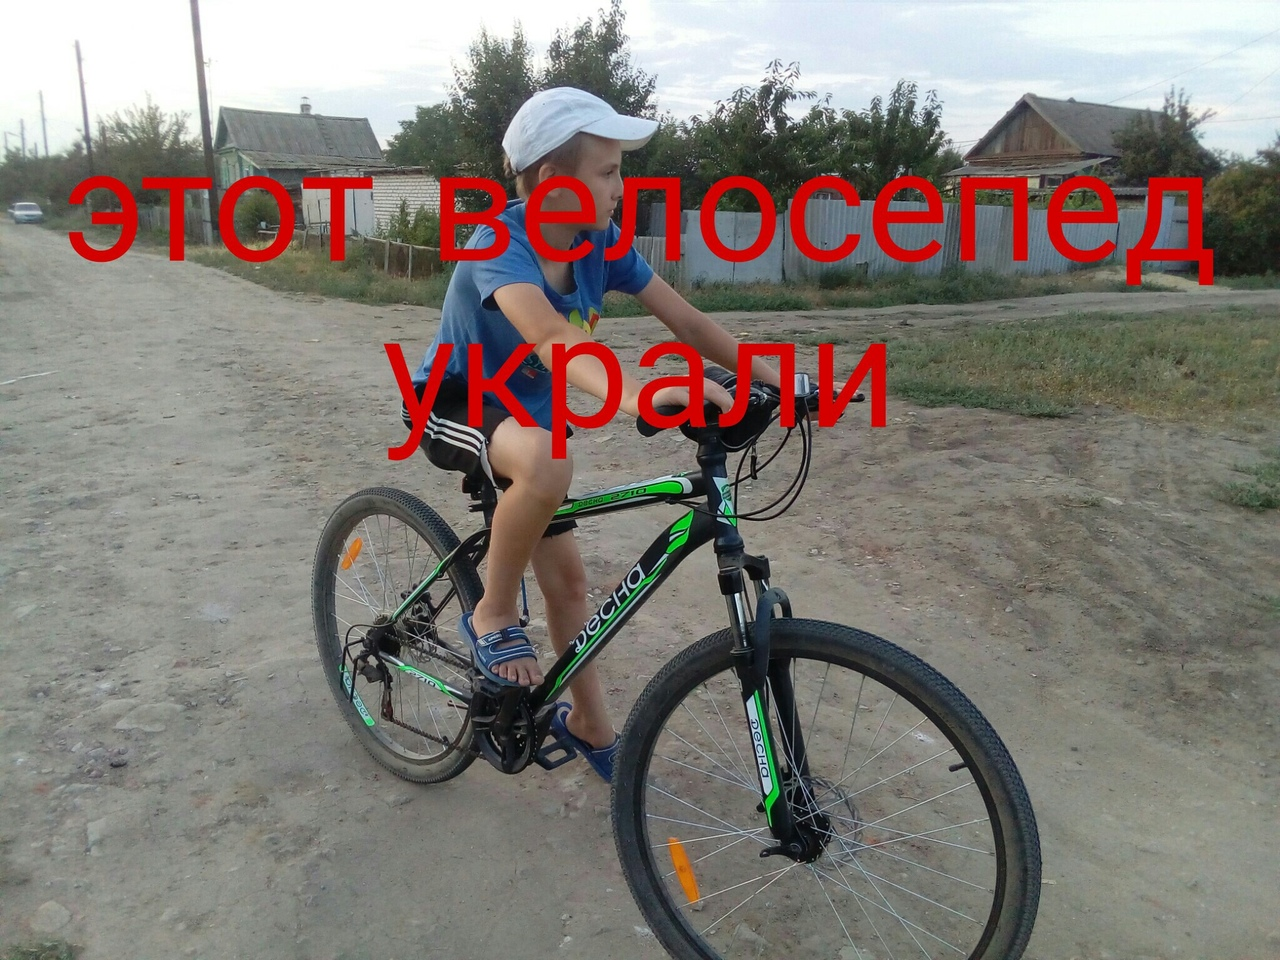 Никита Абраменко, Краснослободск - фото №1